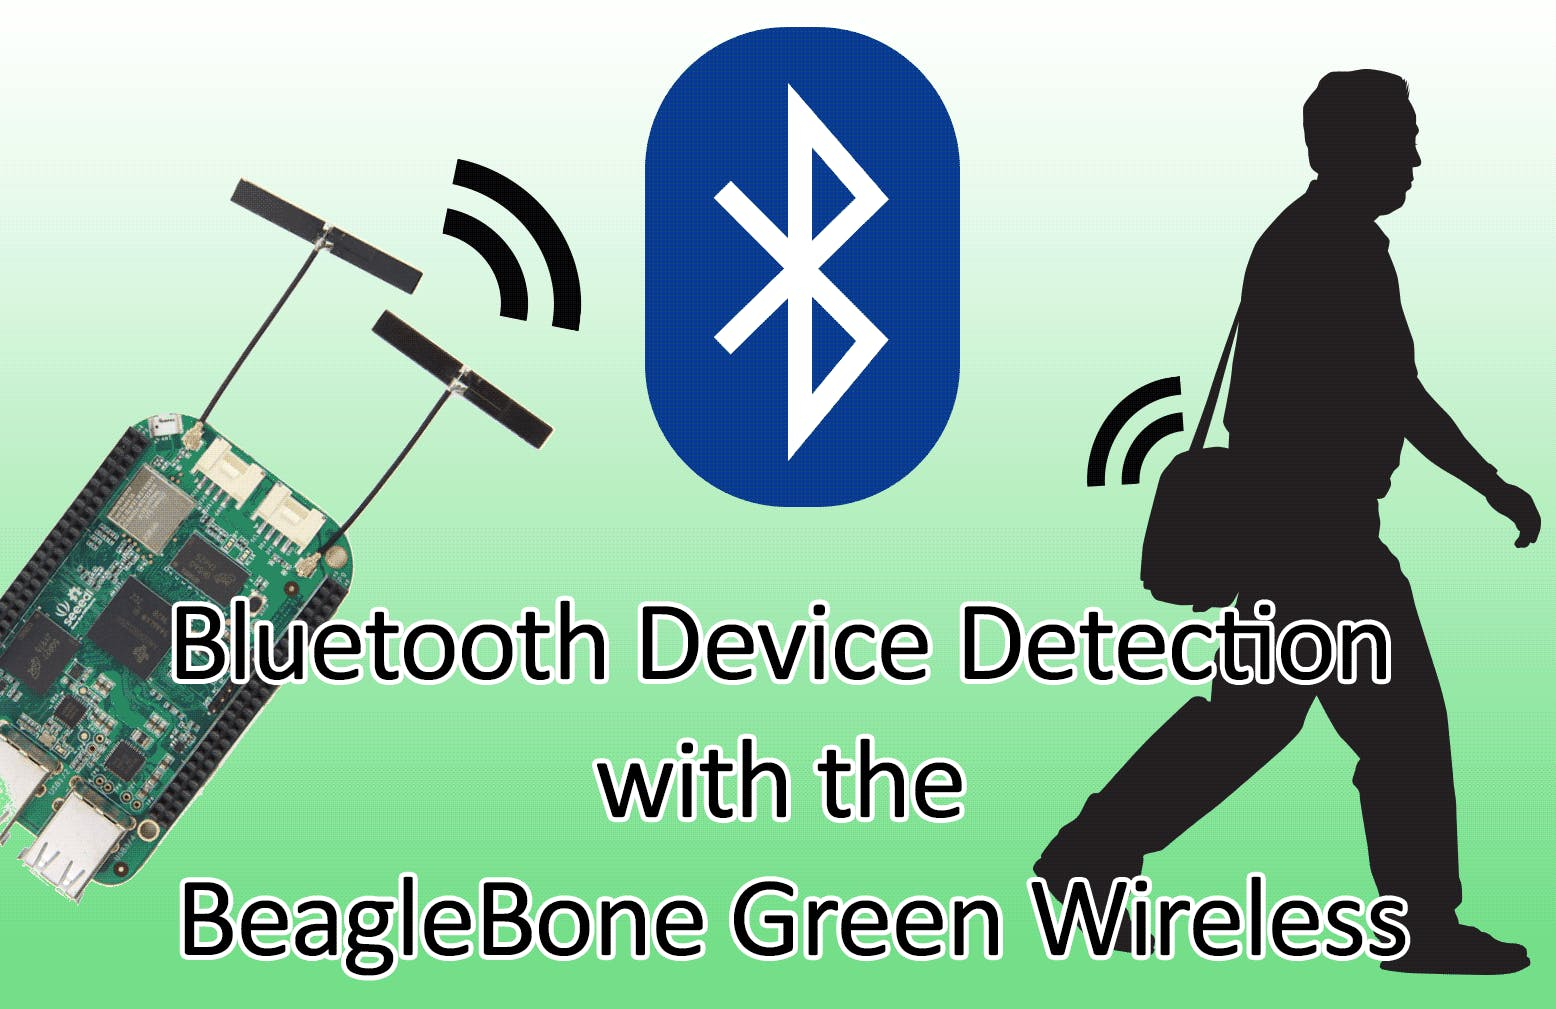 Bluetooth Device Detection with BeagleBone Green Wireless